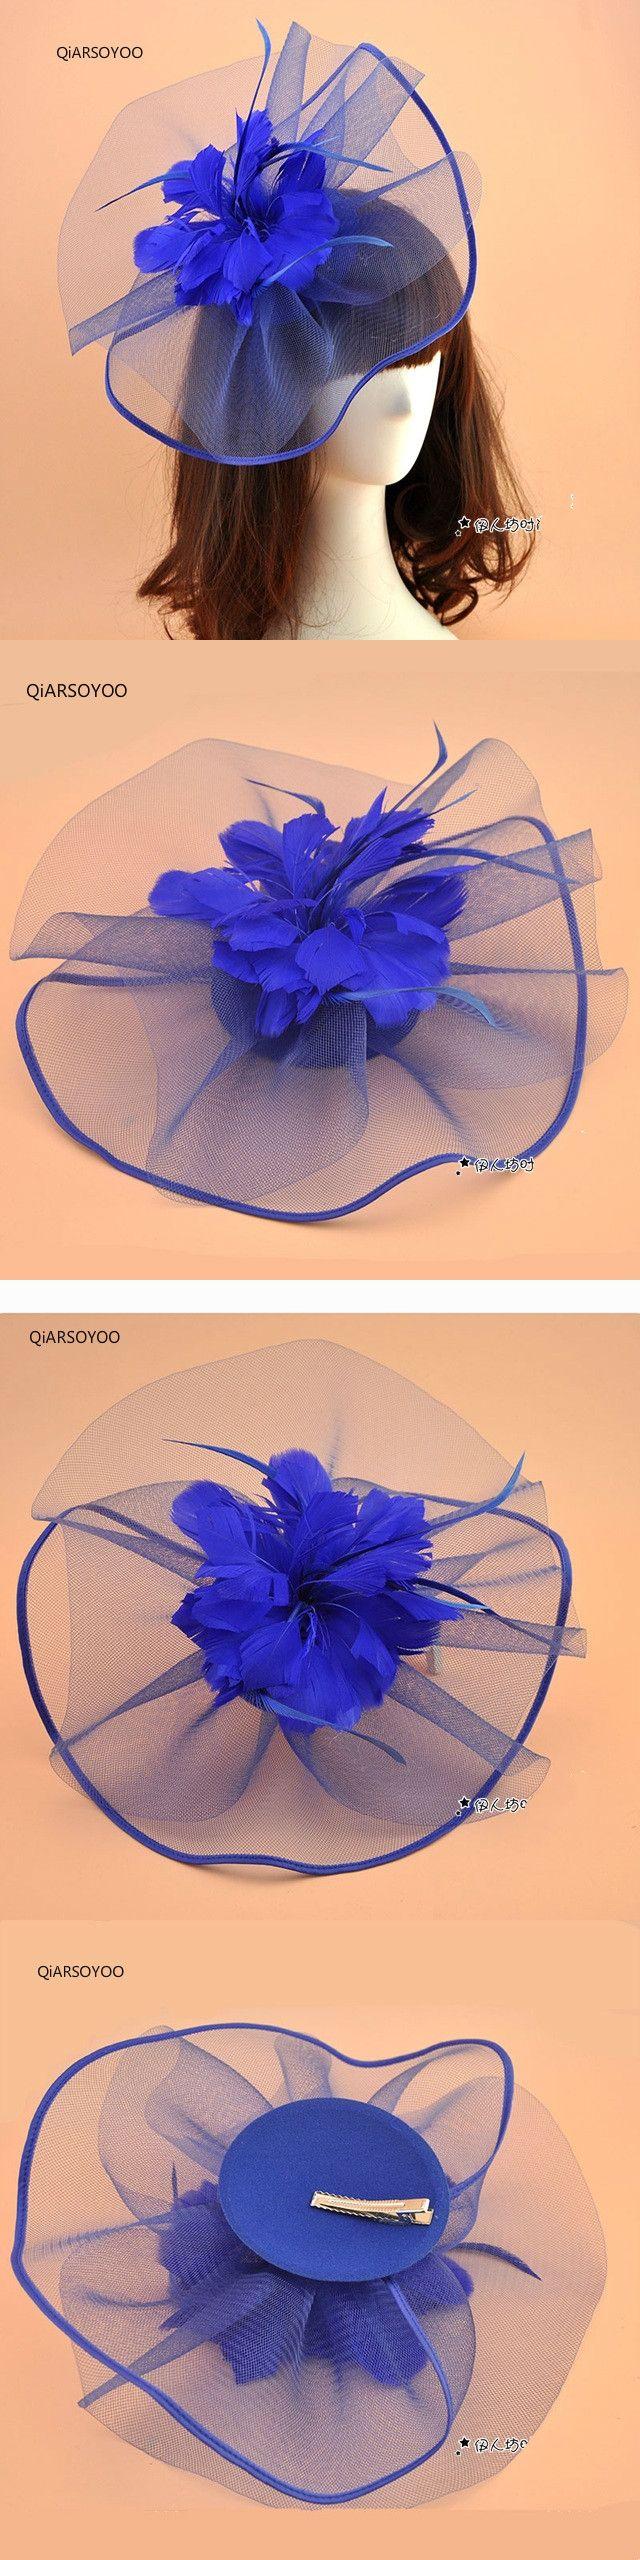 2017 Vintage Vogue Wedding Fascinator Hat Royal Blue Women Mesh Gauze Feather Fascinator Hair Clip Ladies Party Hair Accessories